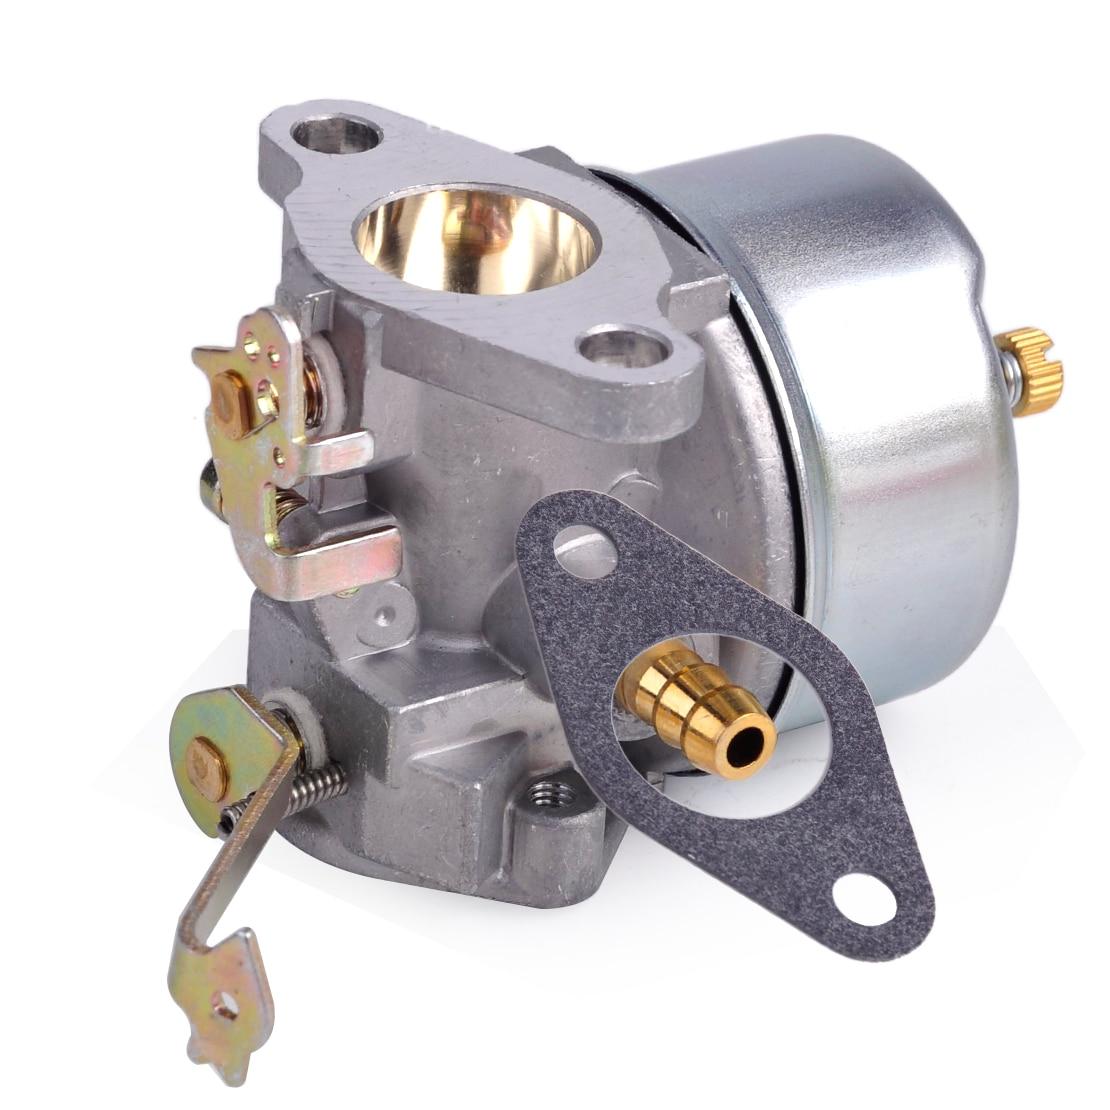 LETAOSK Carburetor Carb Gasket Fit For Tecumseh 632230 632272 H30 H50 H60 HH60 EnginesAccessories